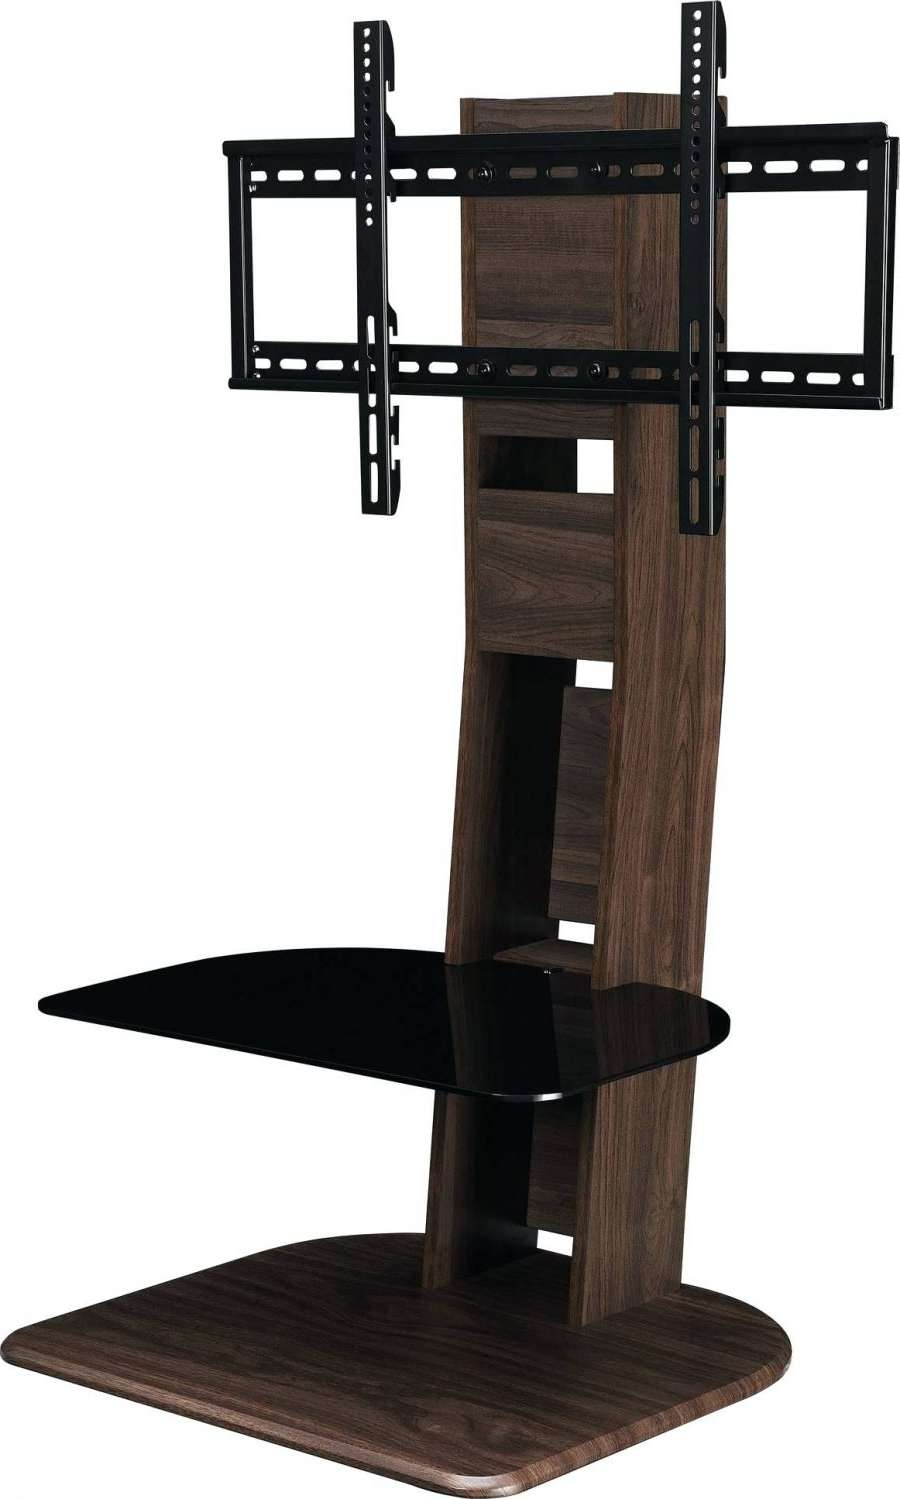 Tv Stand : Glass Shelf Tv Stand Modern Wood Flat Screen With Mount Regarding Single Shelf Tv Stands (View 6 of 15)